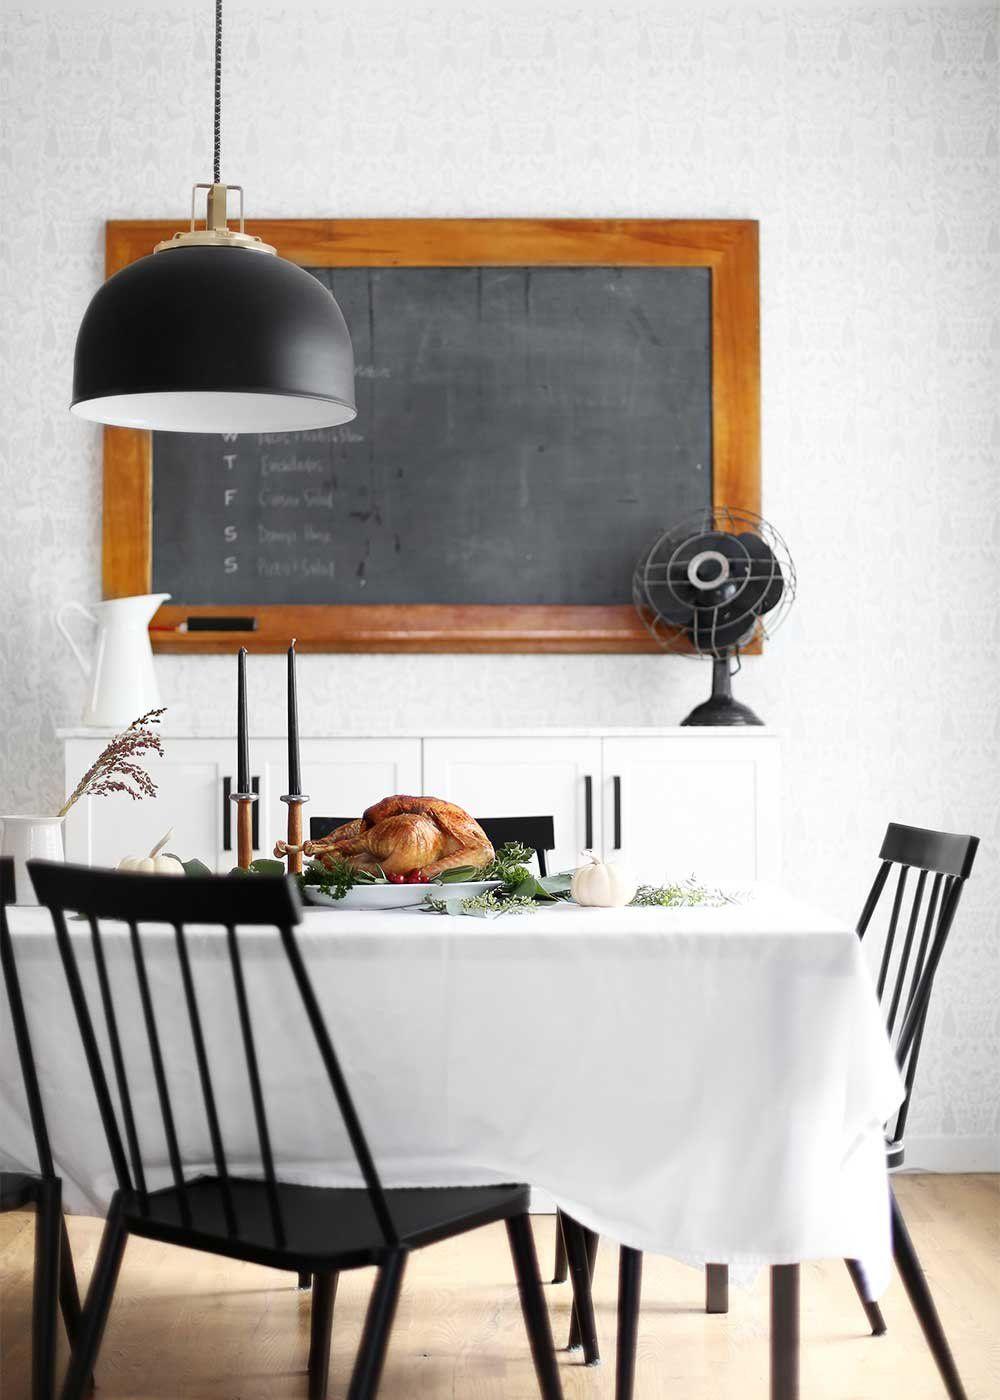 Table setting thanksgiving dinner inspiration butte pendant black dome pendant rejuvenation butte pendant vintage inspired dining room dining room